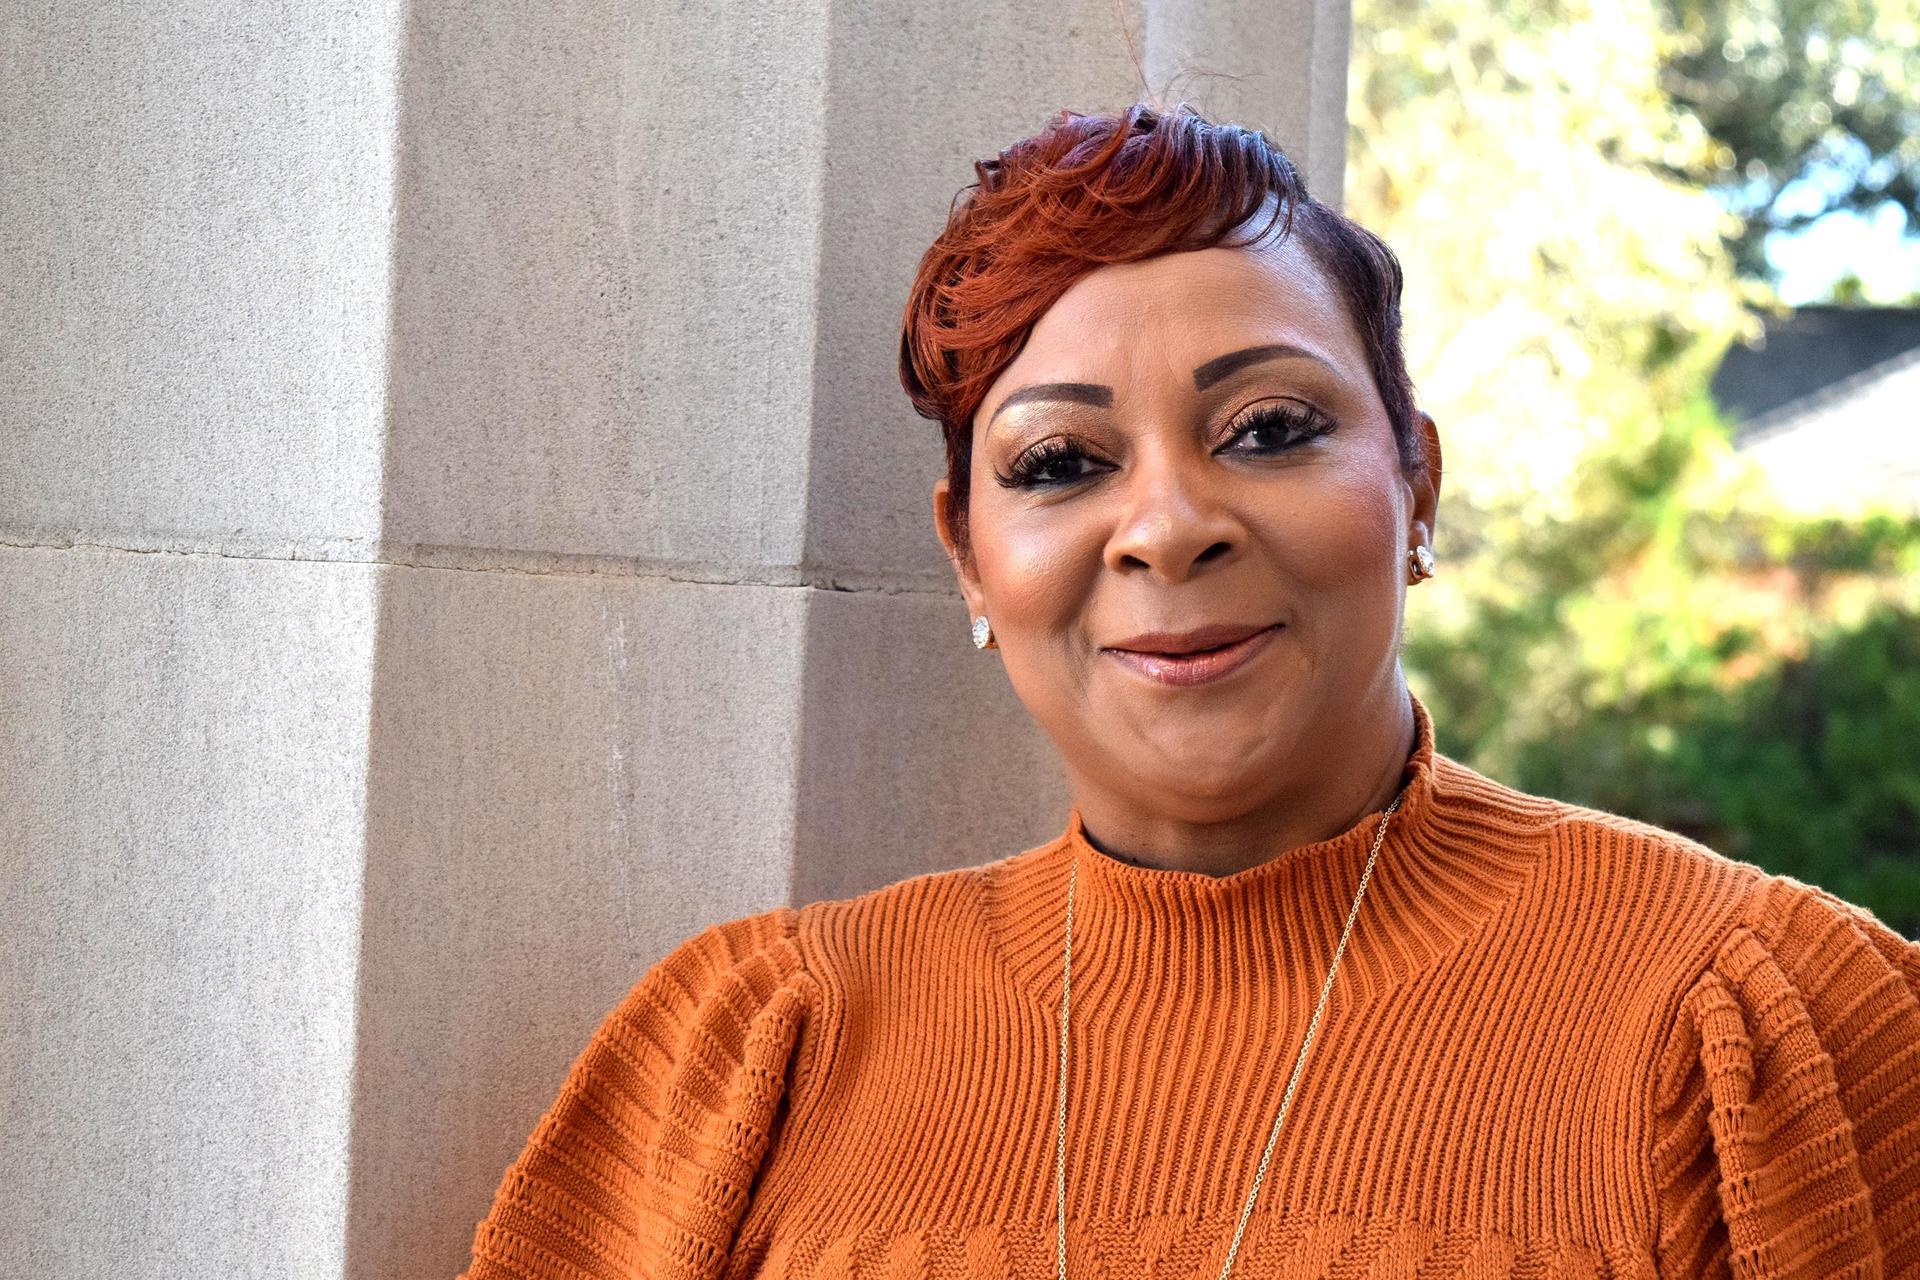 Althea Stewart Natchez High School 2020 Teacher of the Year